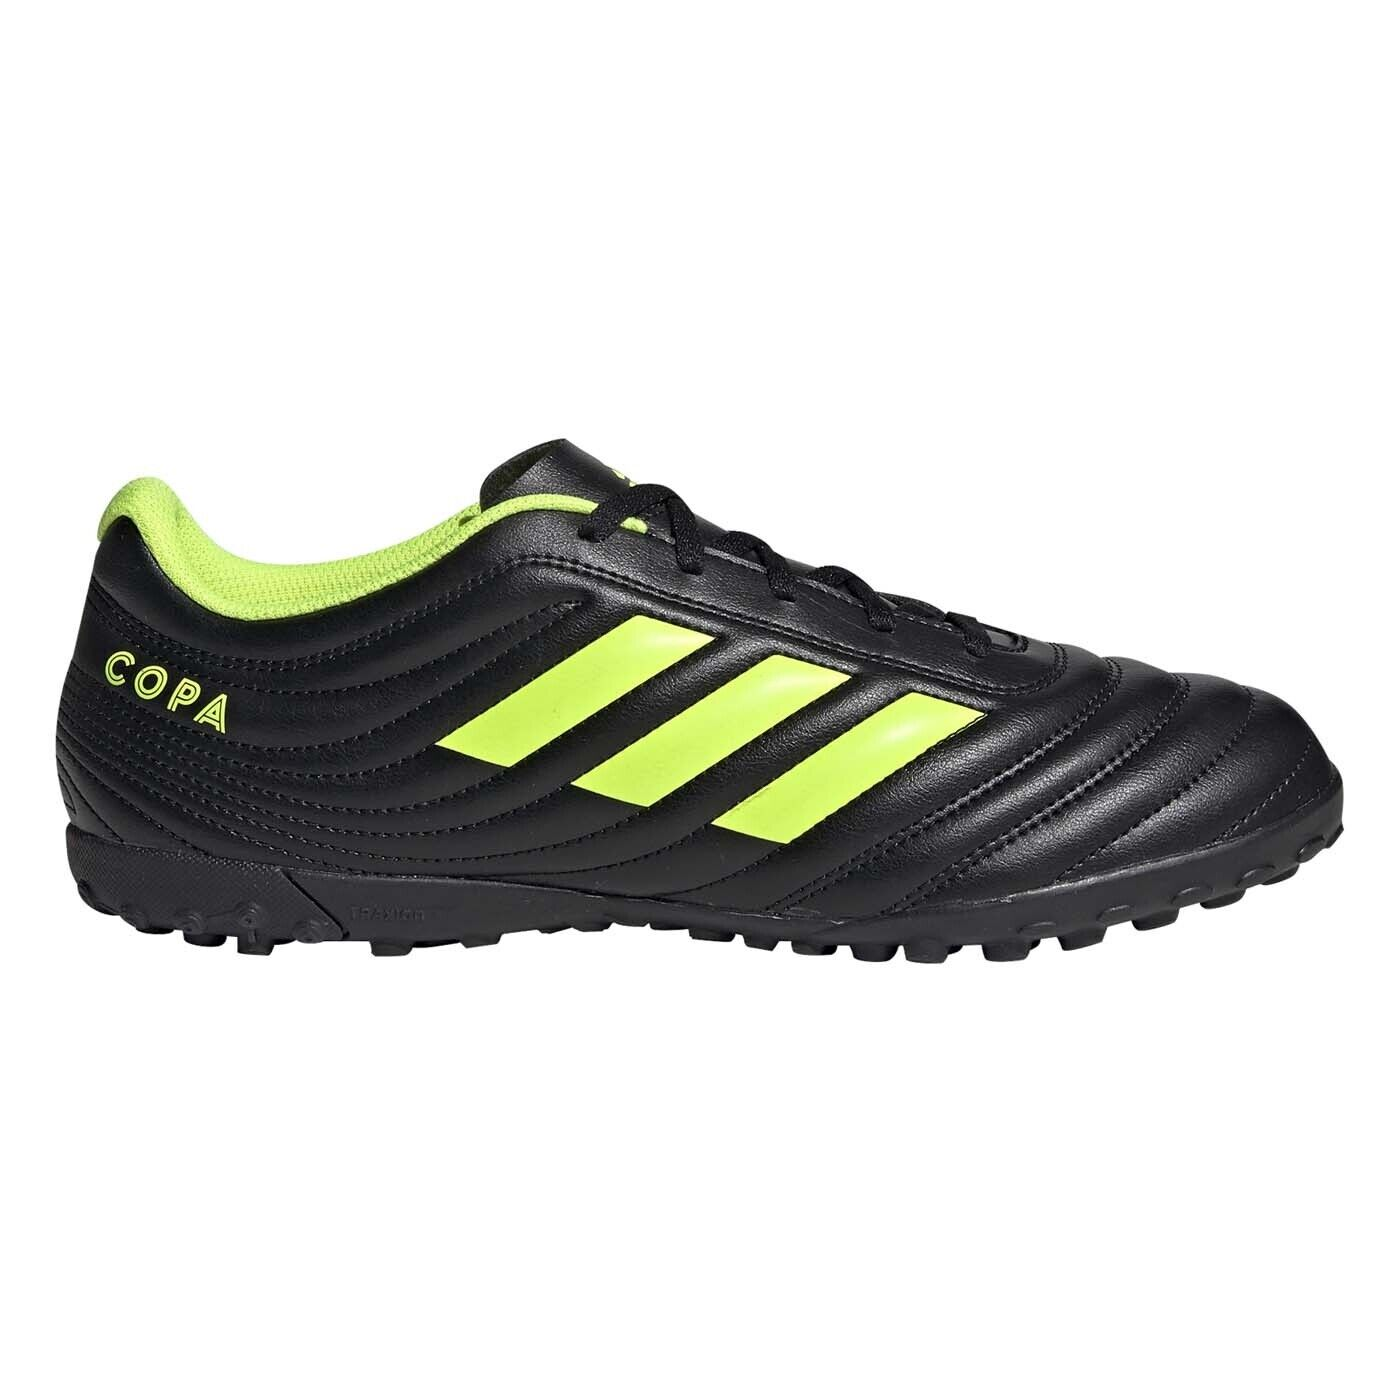 Boda referencia Reanimar  Adidas 19.4 TF Copa 2019 Turf Soccer Shoes Green / Black All Sizes-BB8097    eBay